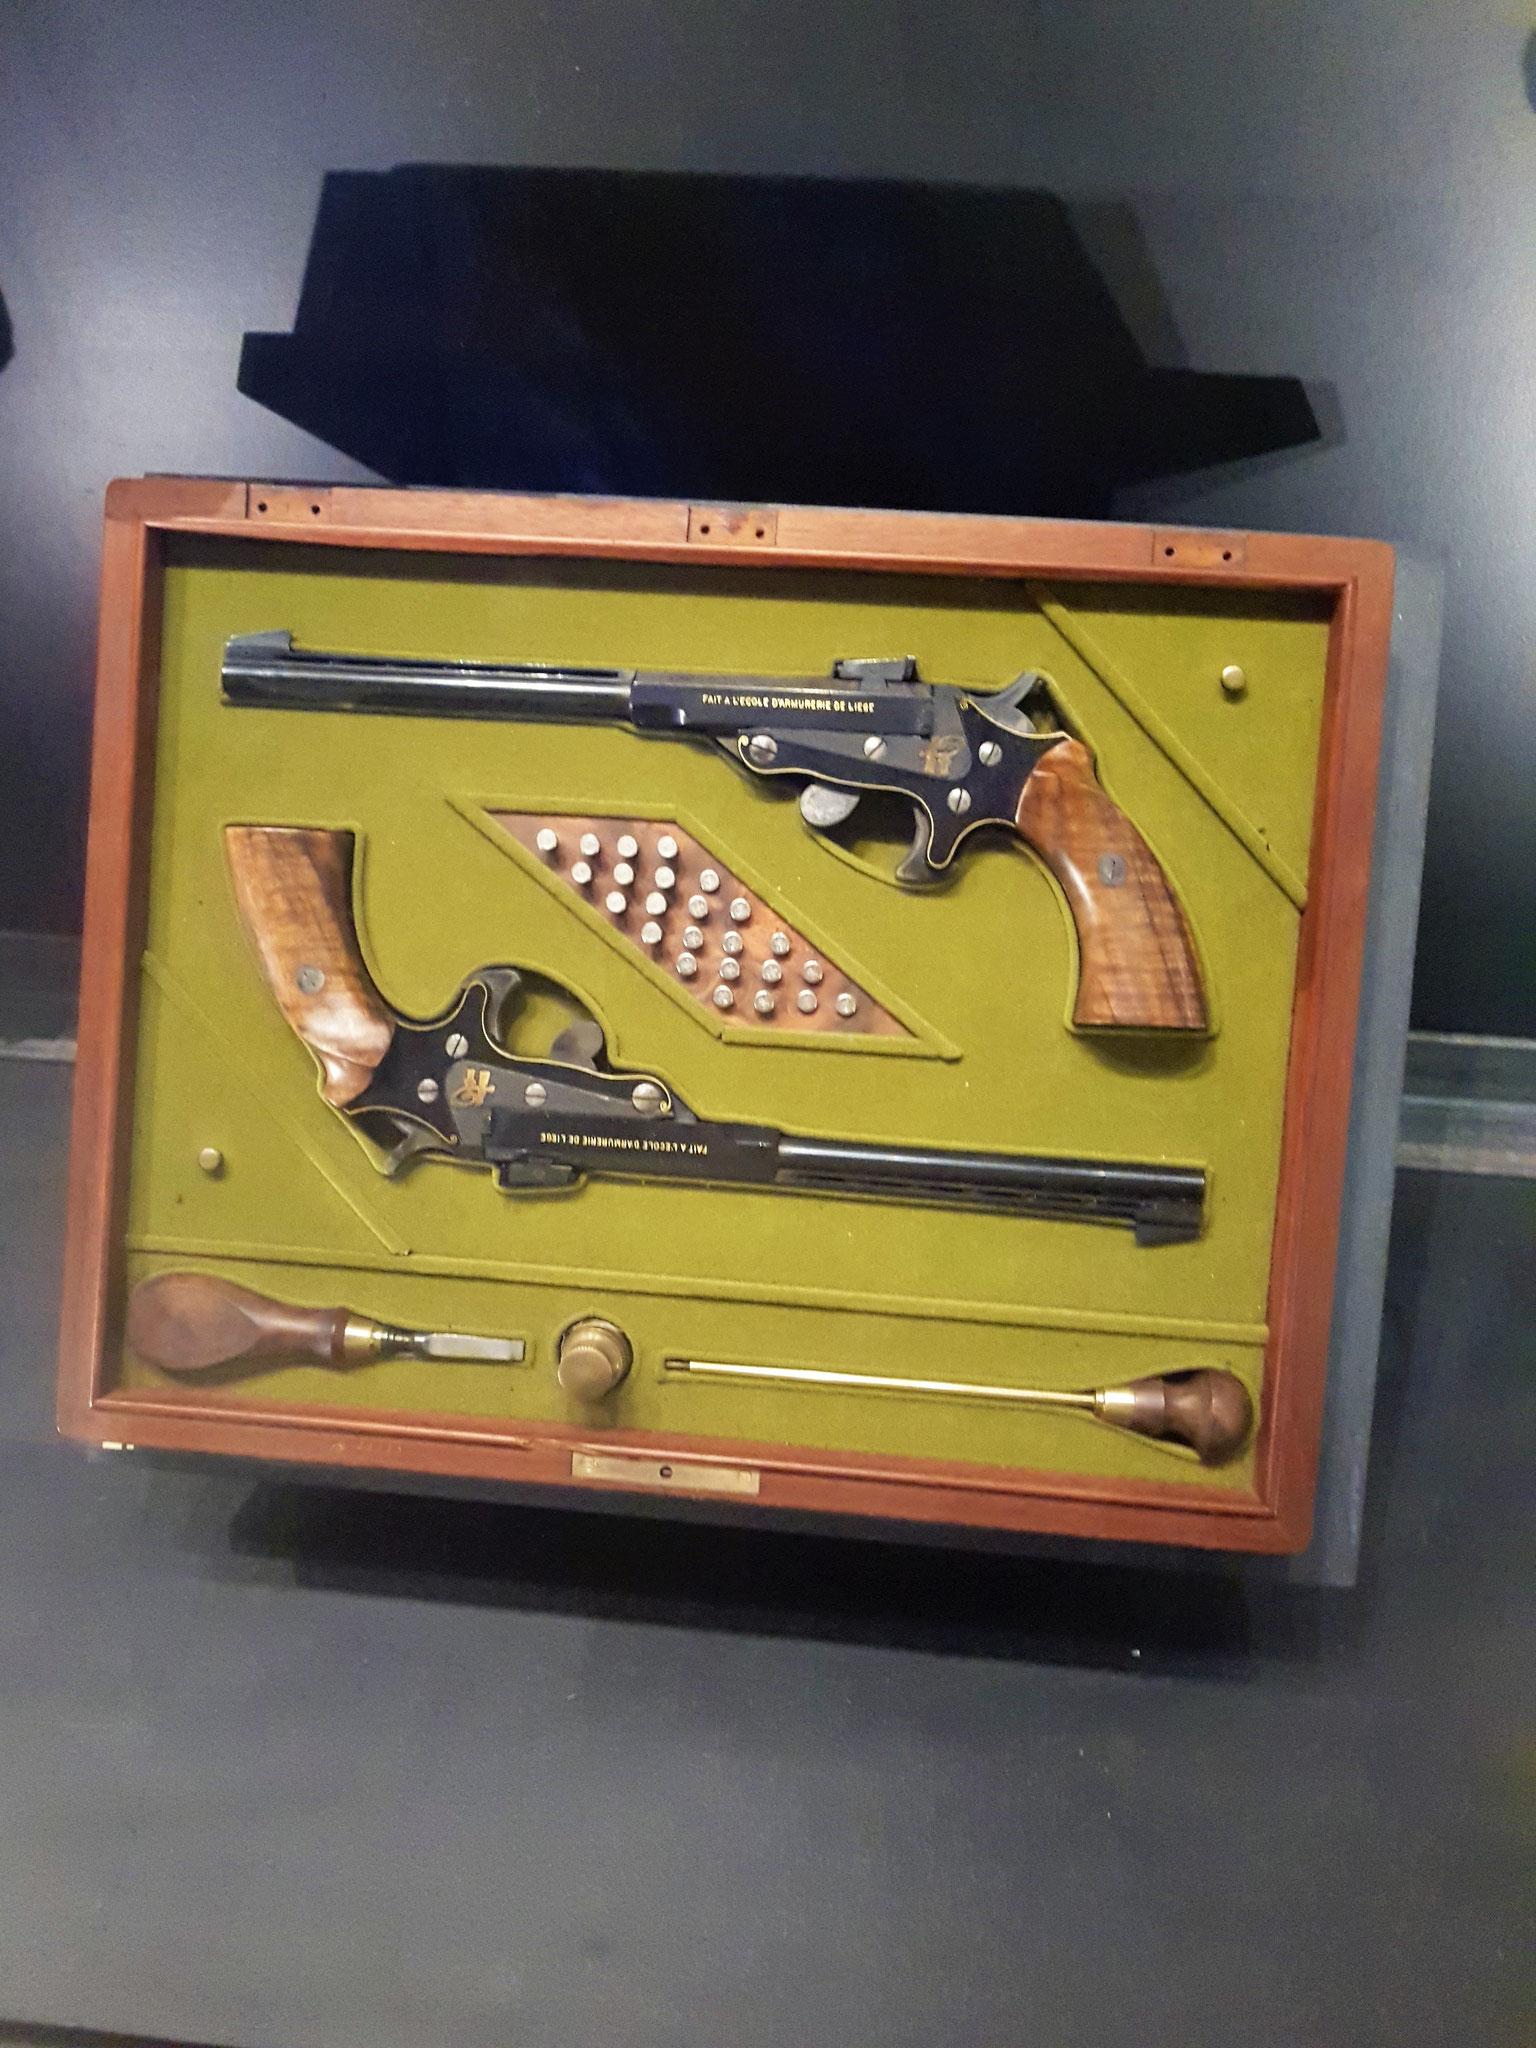 en sportpistolen.